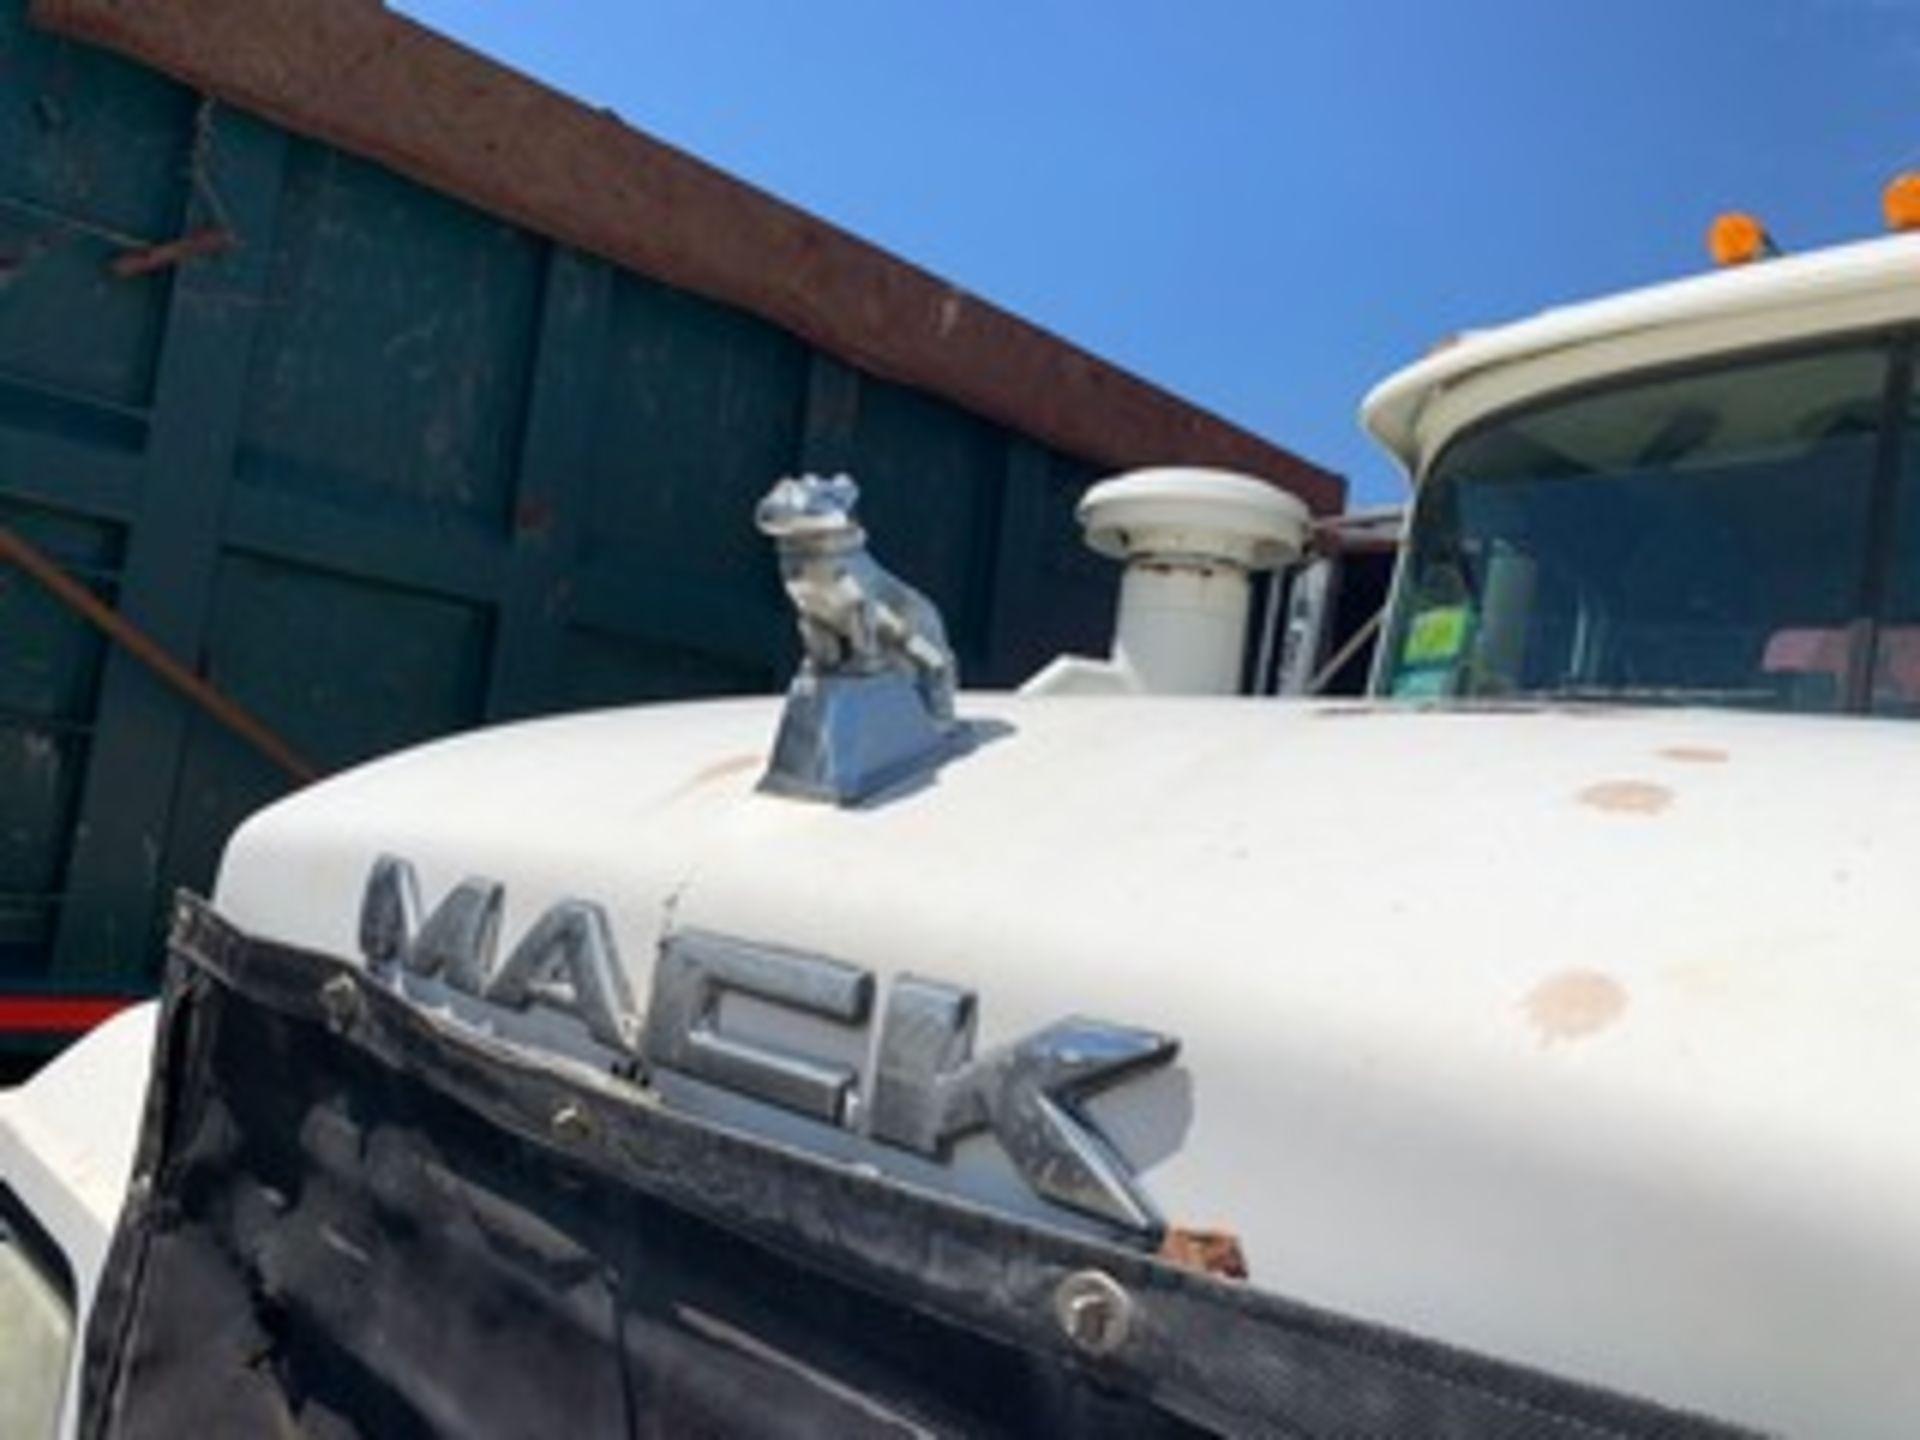 Lot 731 - 2003 MACK GRAPPLE TRUCK - VIN #1M2P267C83M166686 - WHITE